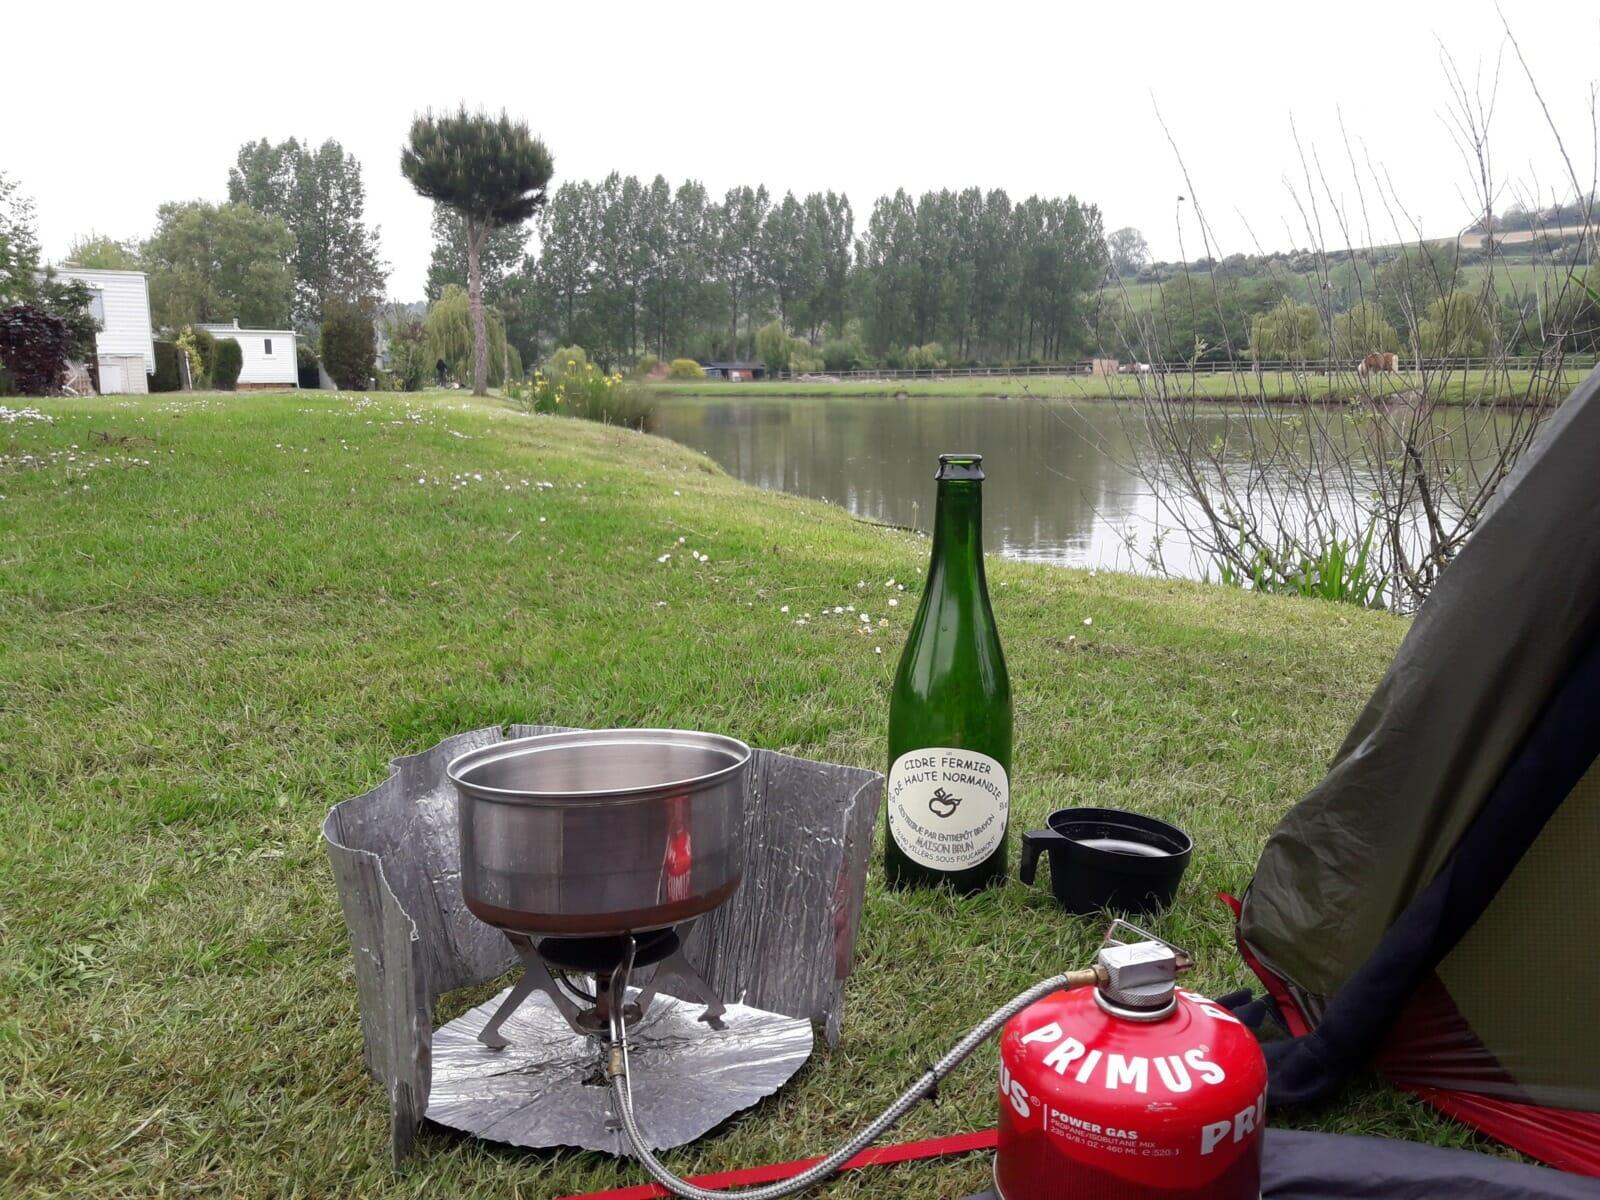 Stove lake bottle of cider